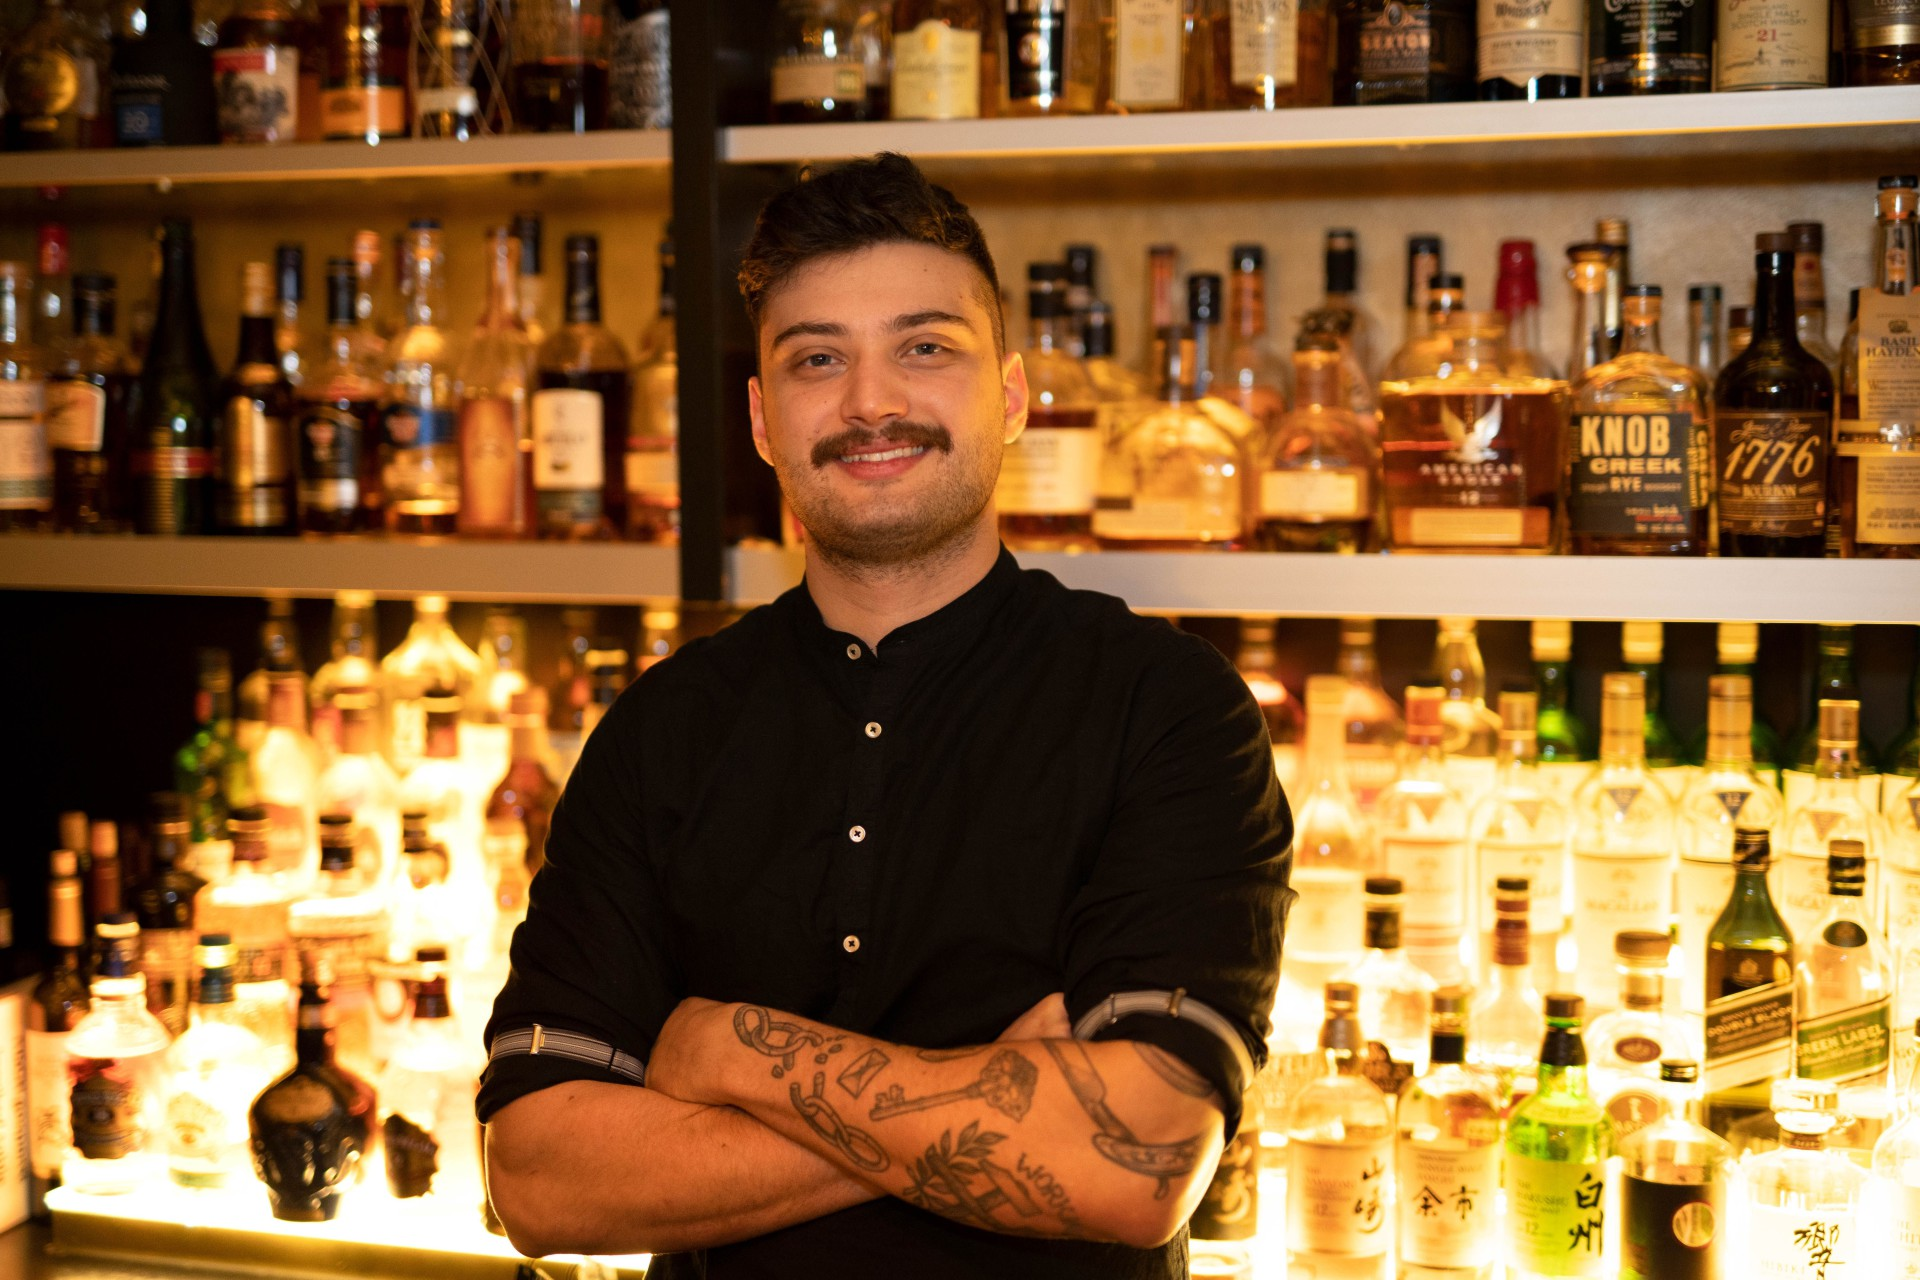 Artur Martoyan, Barkeeper, Alkohol, Cocktails, Bar